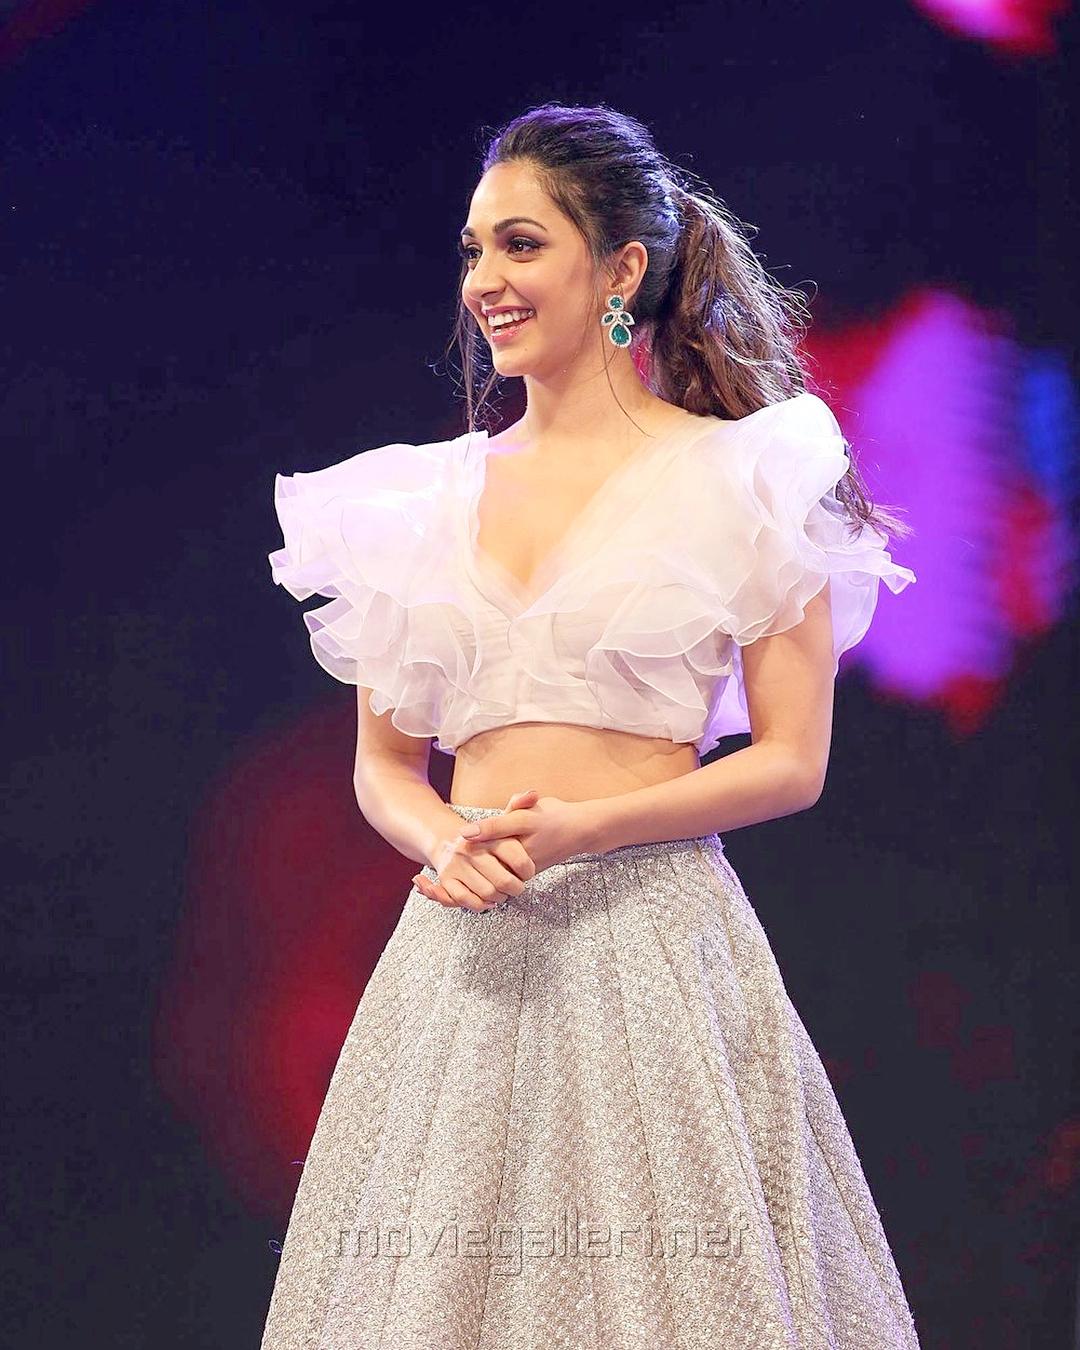 Kiara Advani cute photo